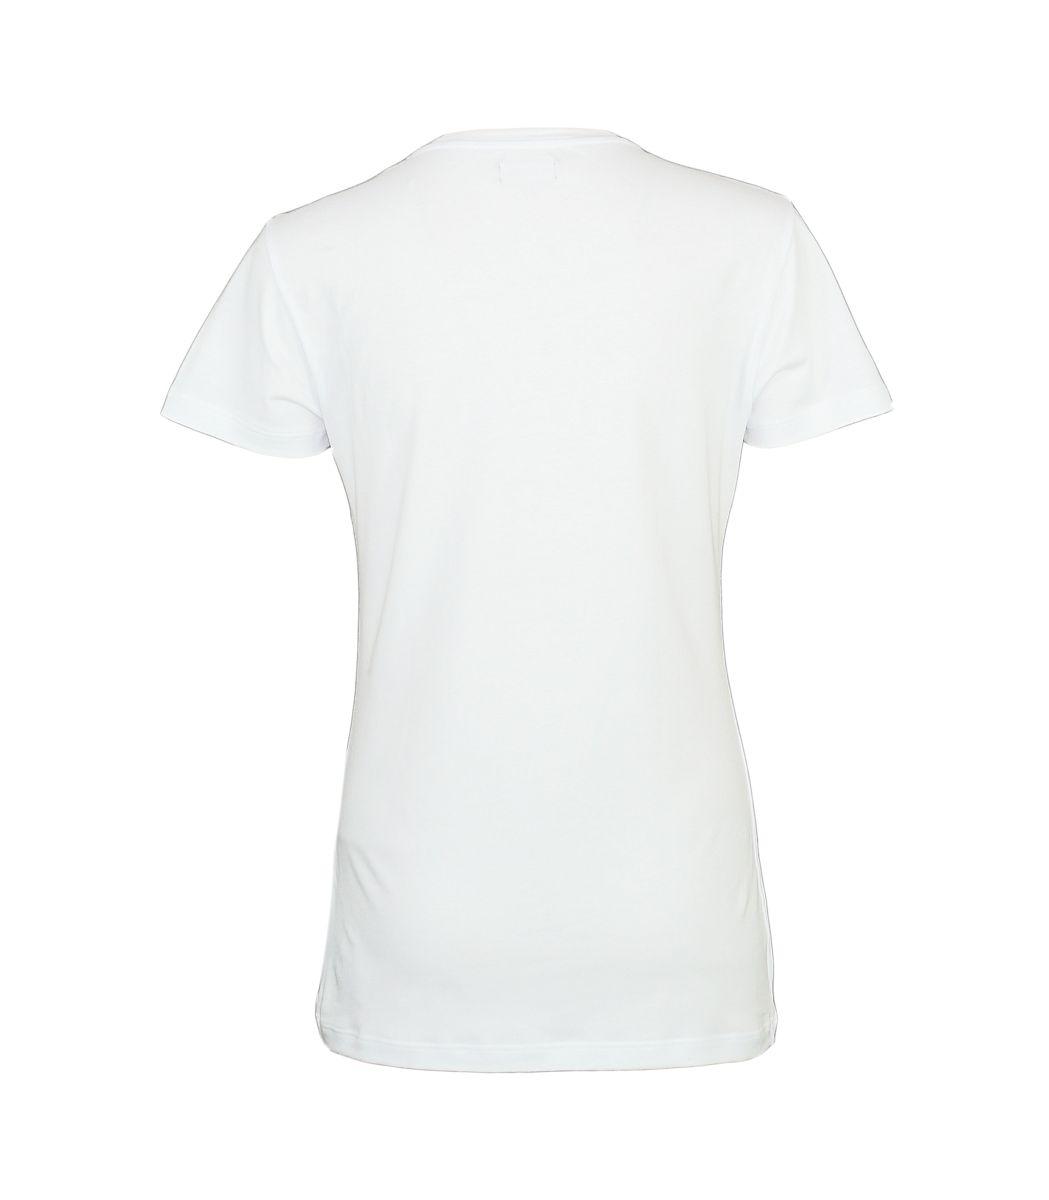 Emporio Armani Damen Shirt T-Shirt Rundhals 163139 7A317 00010 BIANCO HW17-EADS1